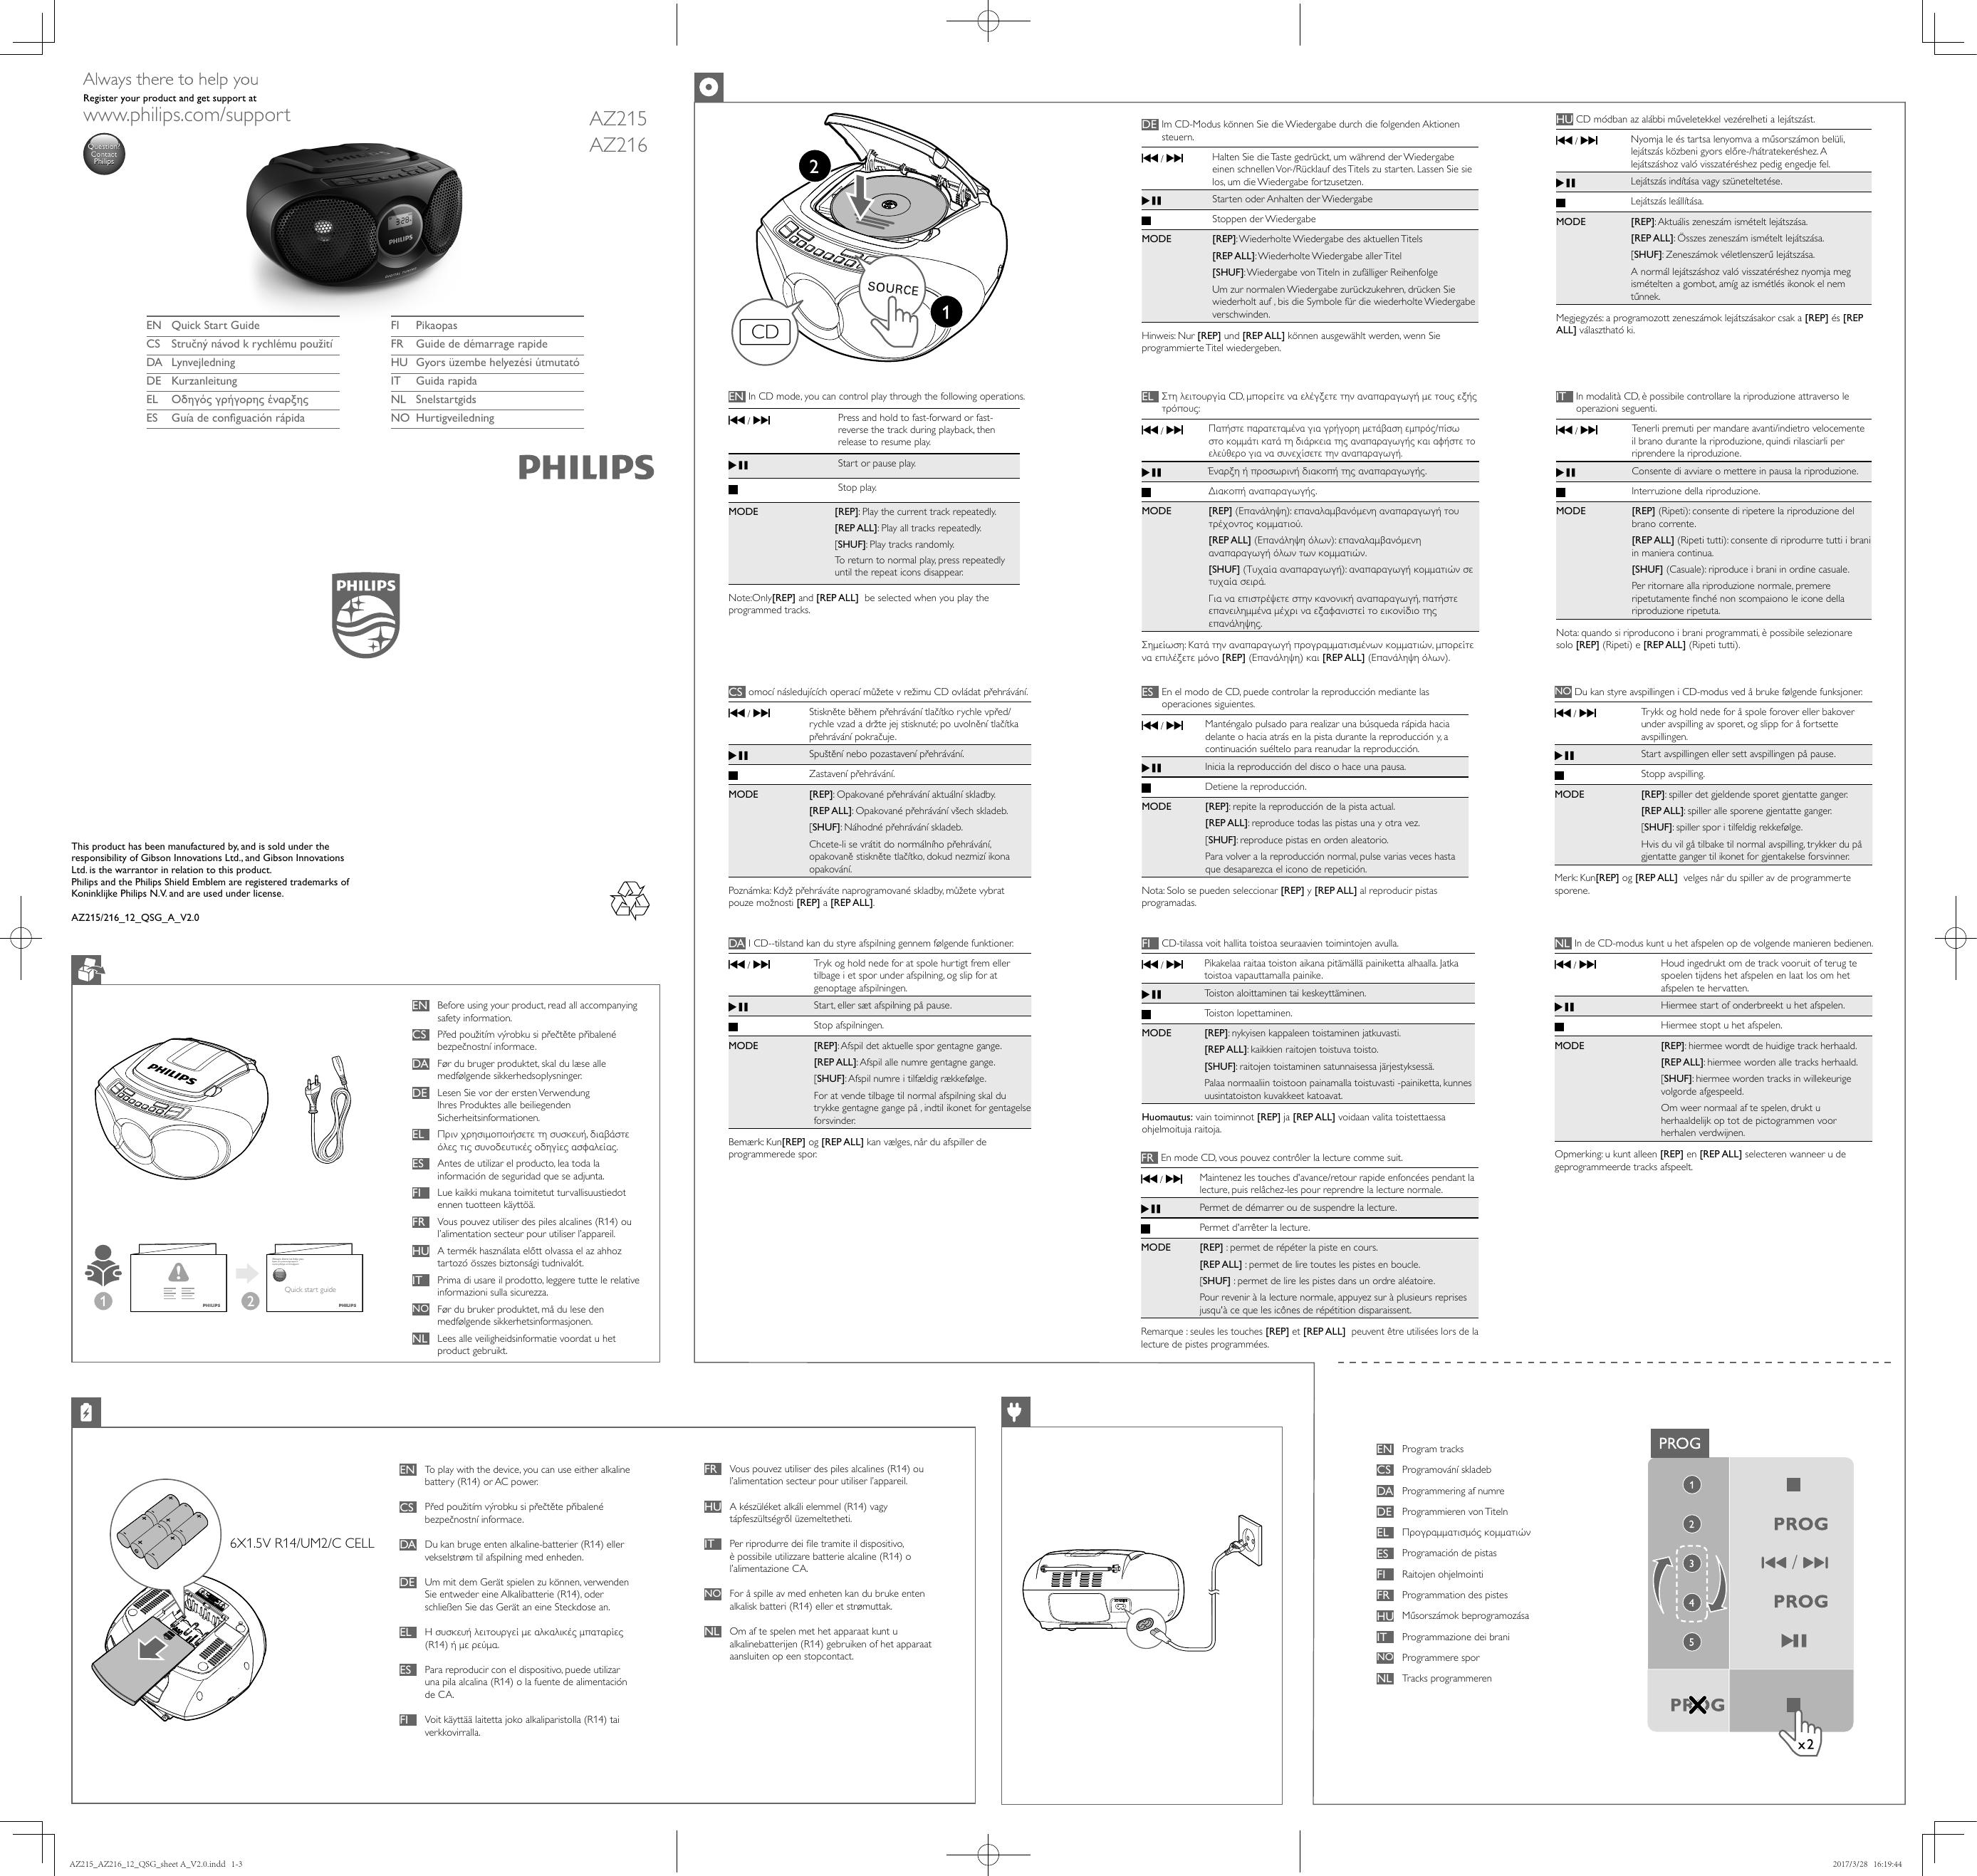 Philips Az215g12 User Manual Quick Start Guide Az215g 12 Qsg Ita